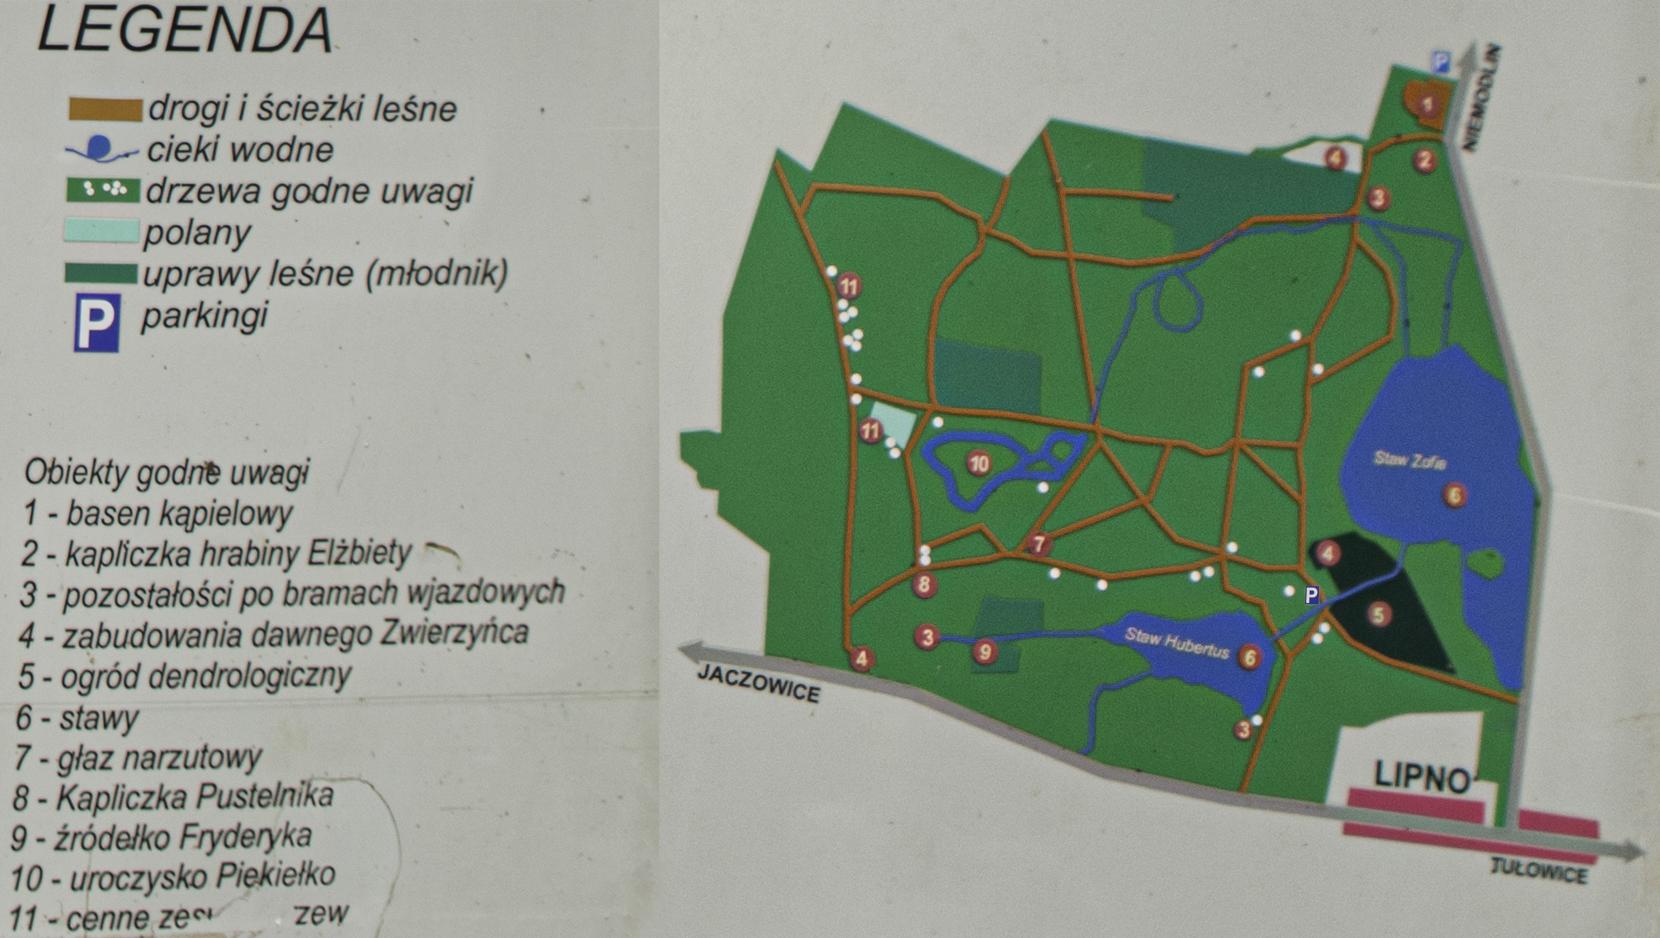 Arboretum w lipnie - mapa